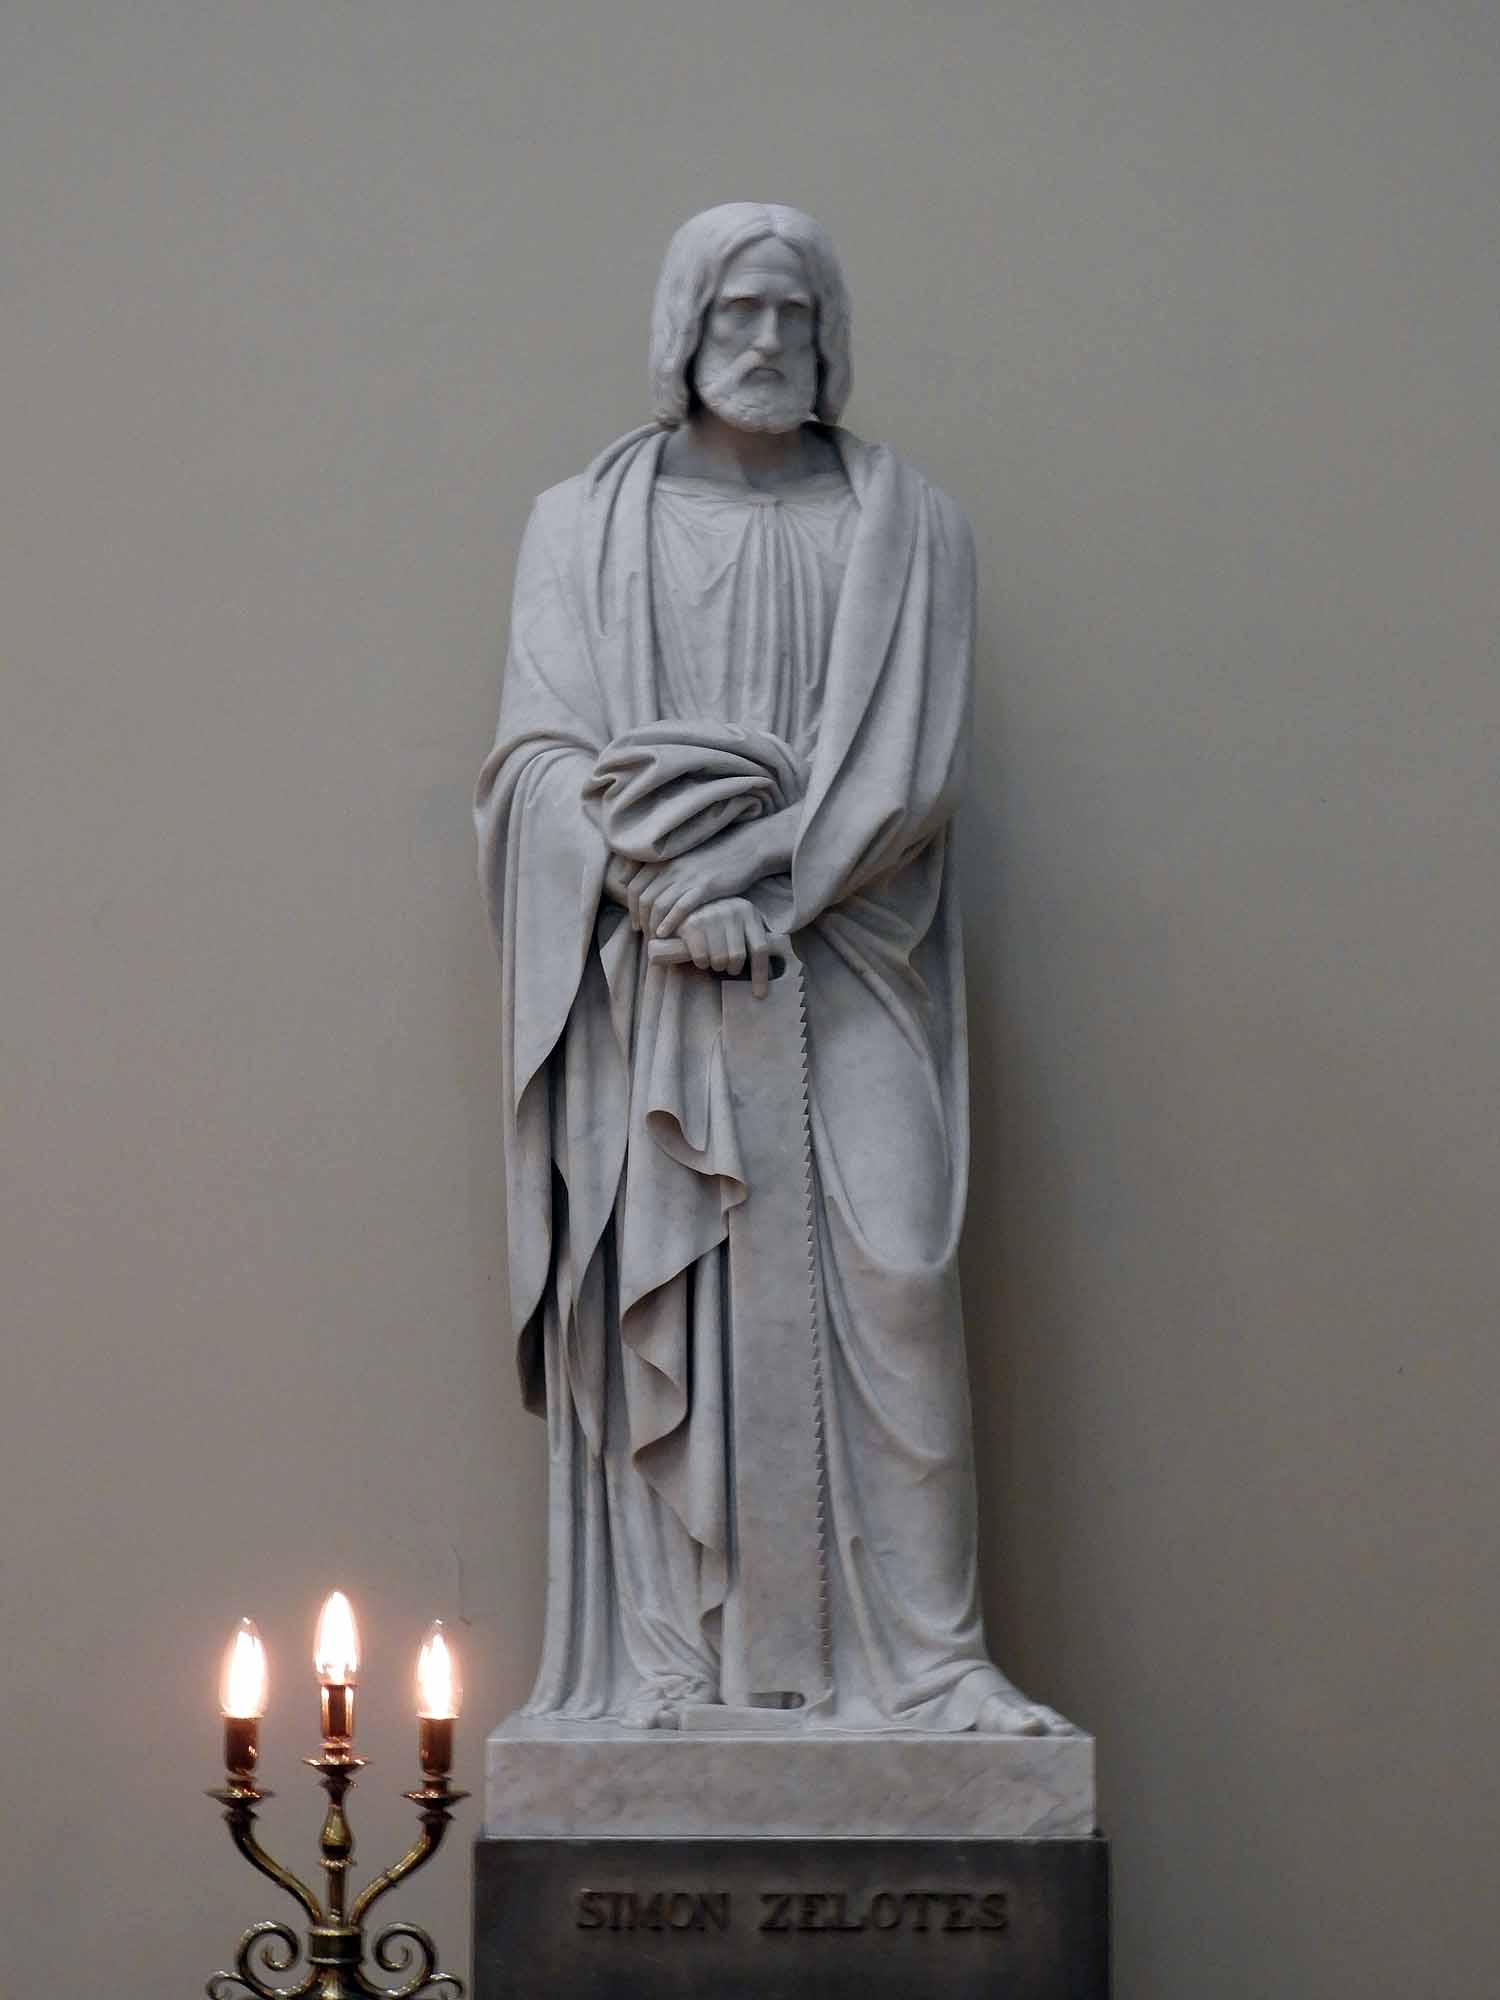 denmark-copenhagen-vor-frue-kirke-cathederal-apostle simon-zelotes-simon-zealot.JPG